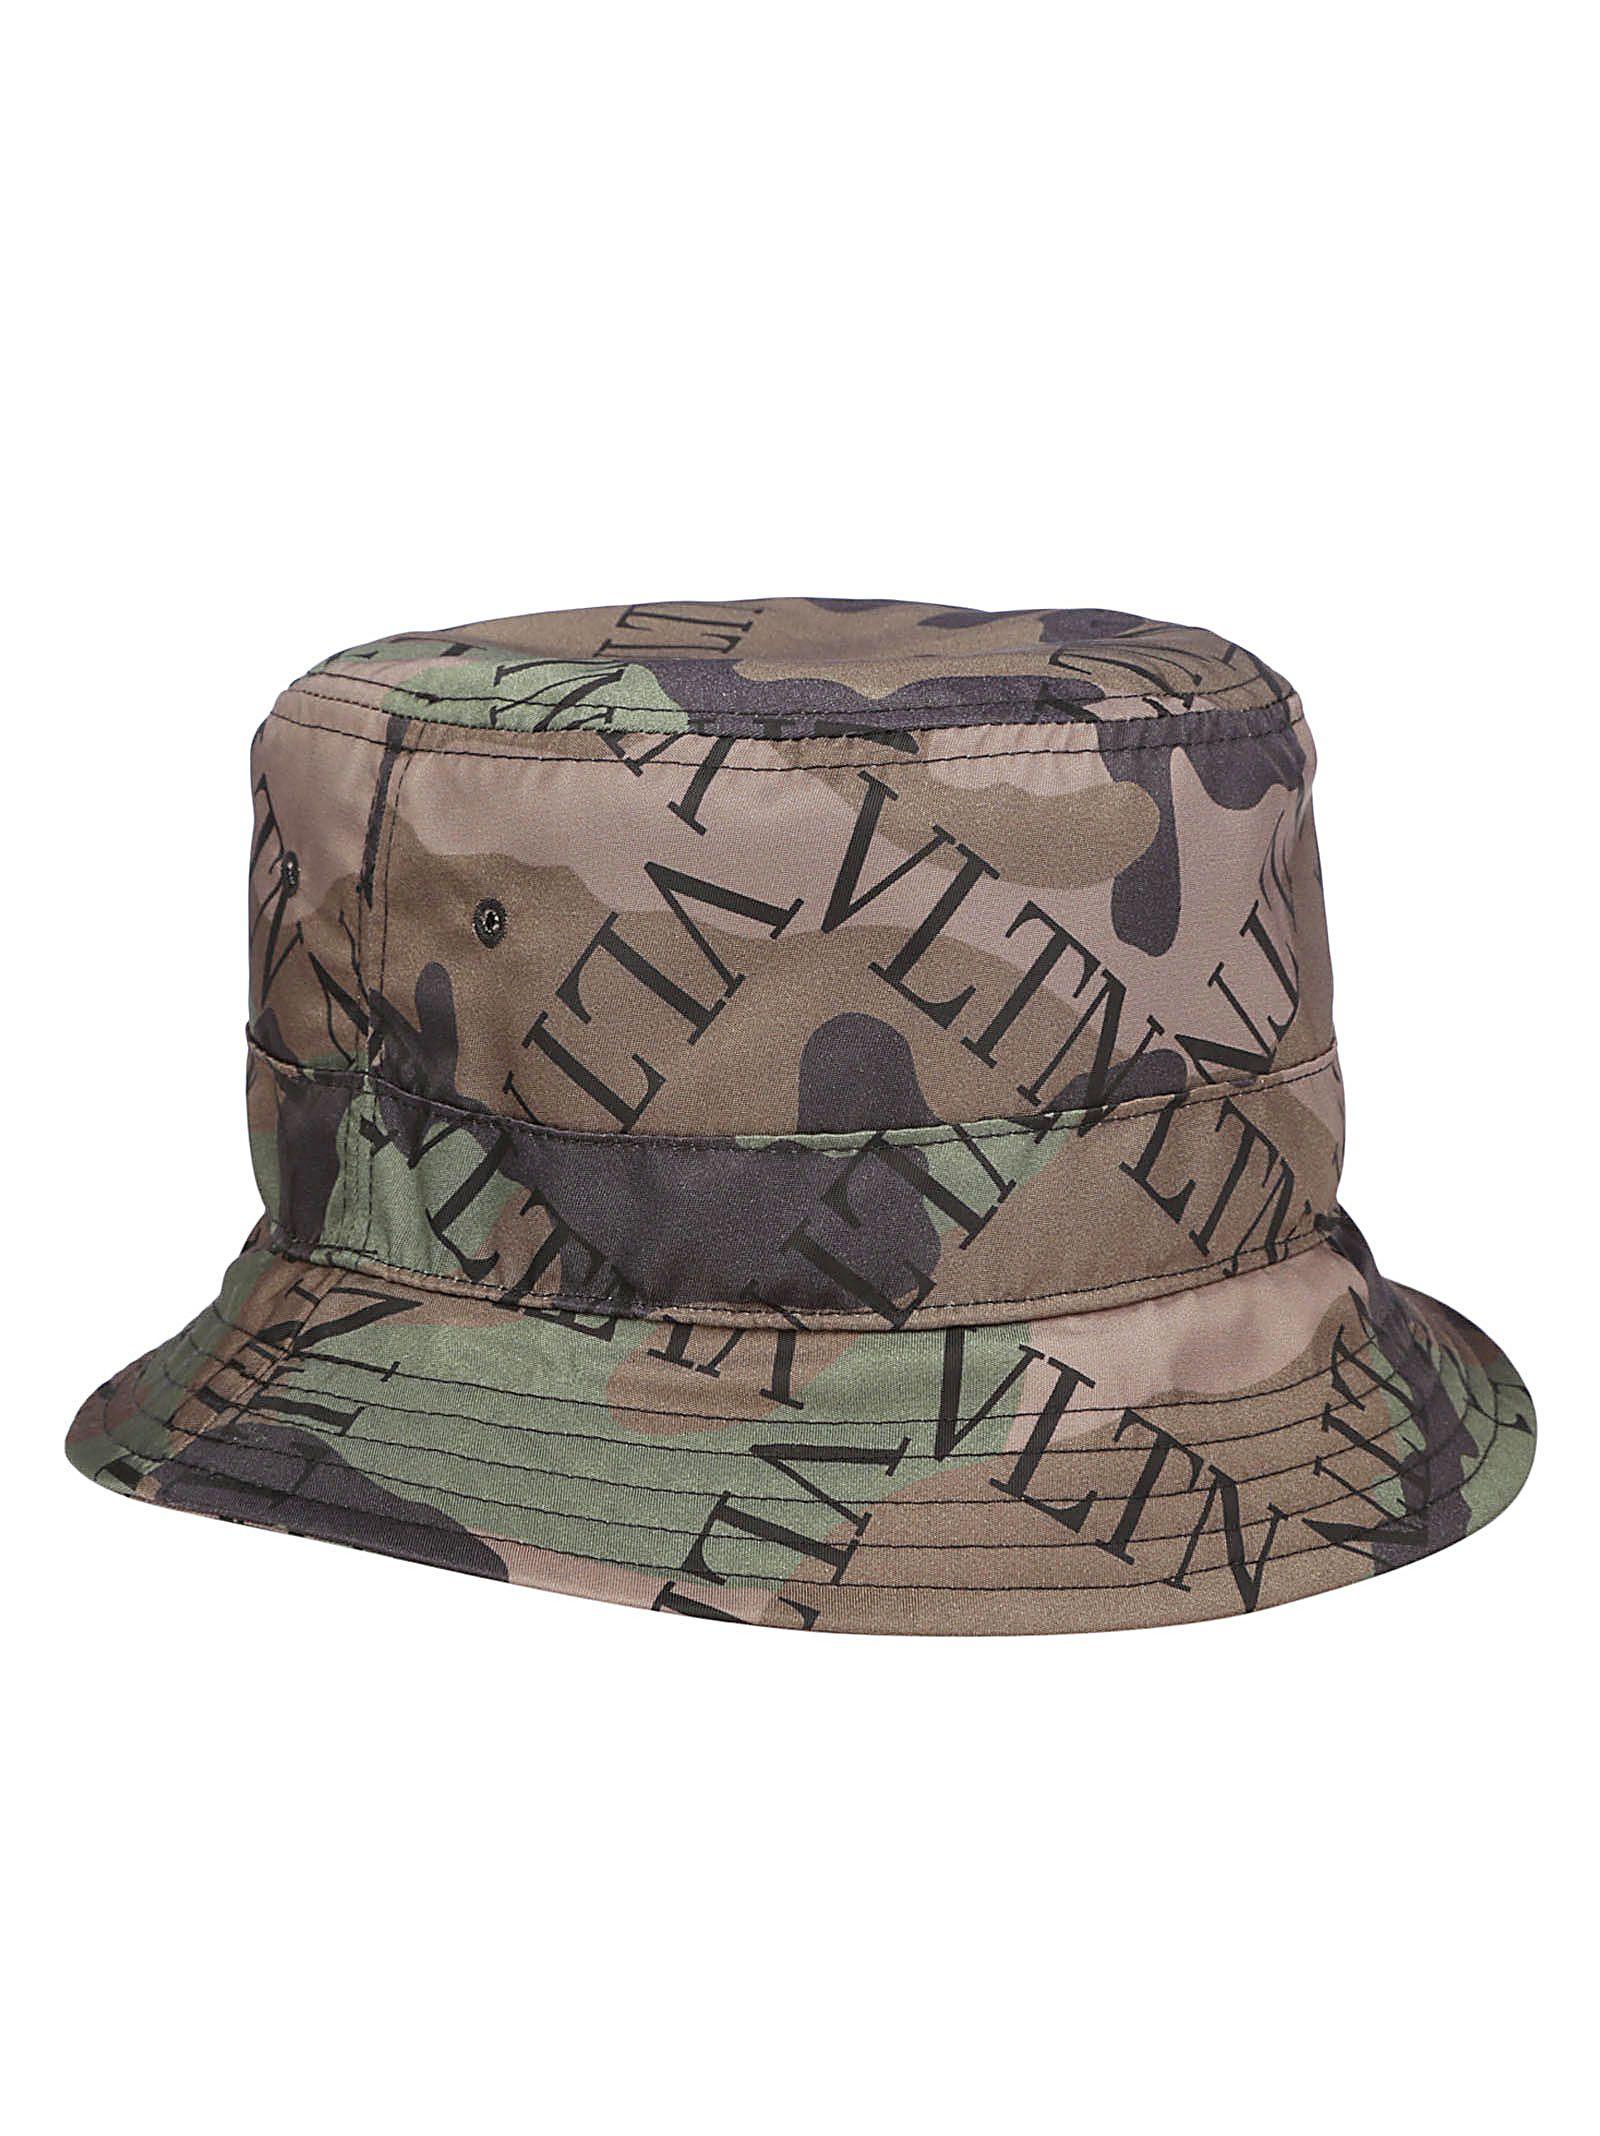 Valentino Bucket Hat In Army Green Brush Wood  0b84a31dbec